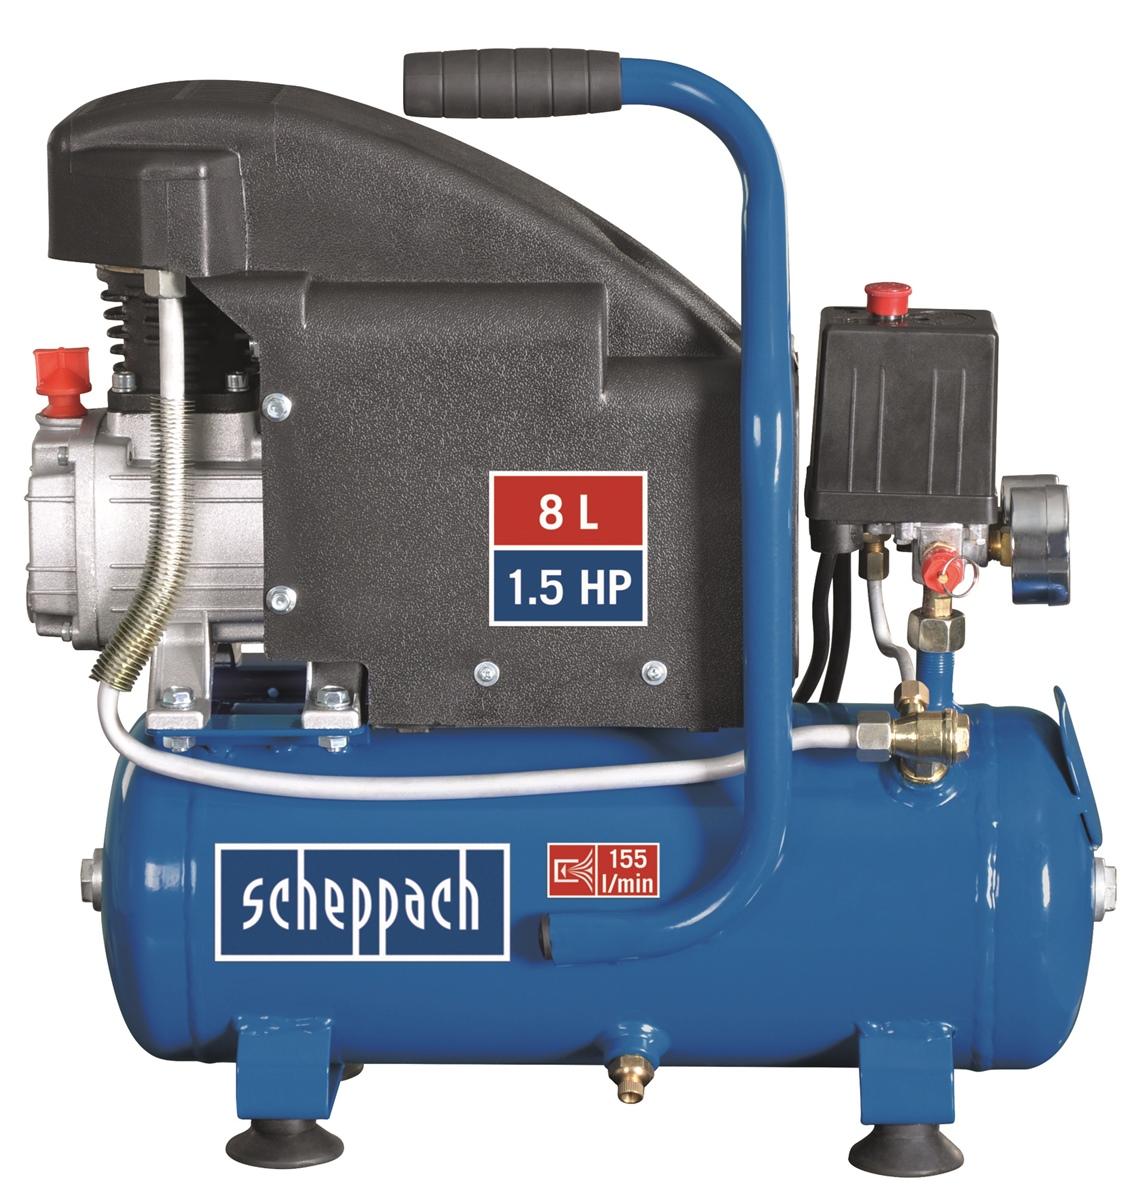 scheppach hc08 druckluft kompressor 8 bar 1 5 ps 8 liter neu. Black Bedroom Furniture Sets. Home Design Ideas